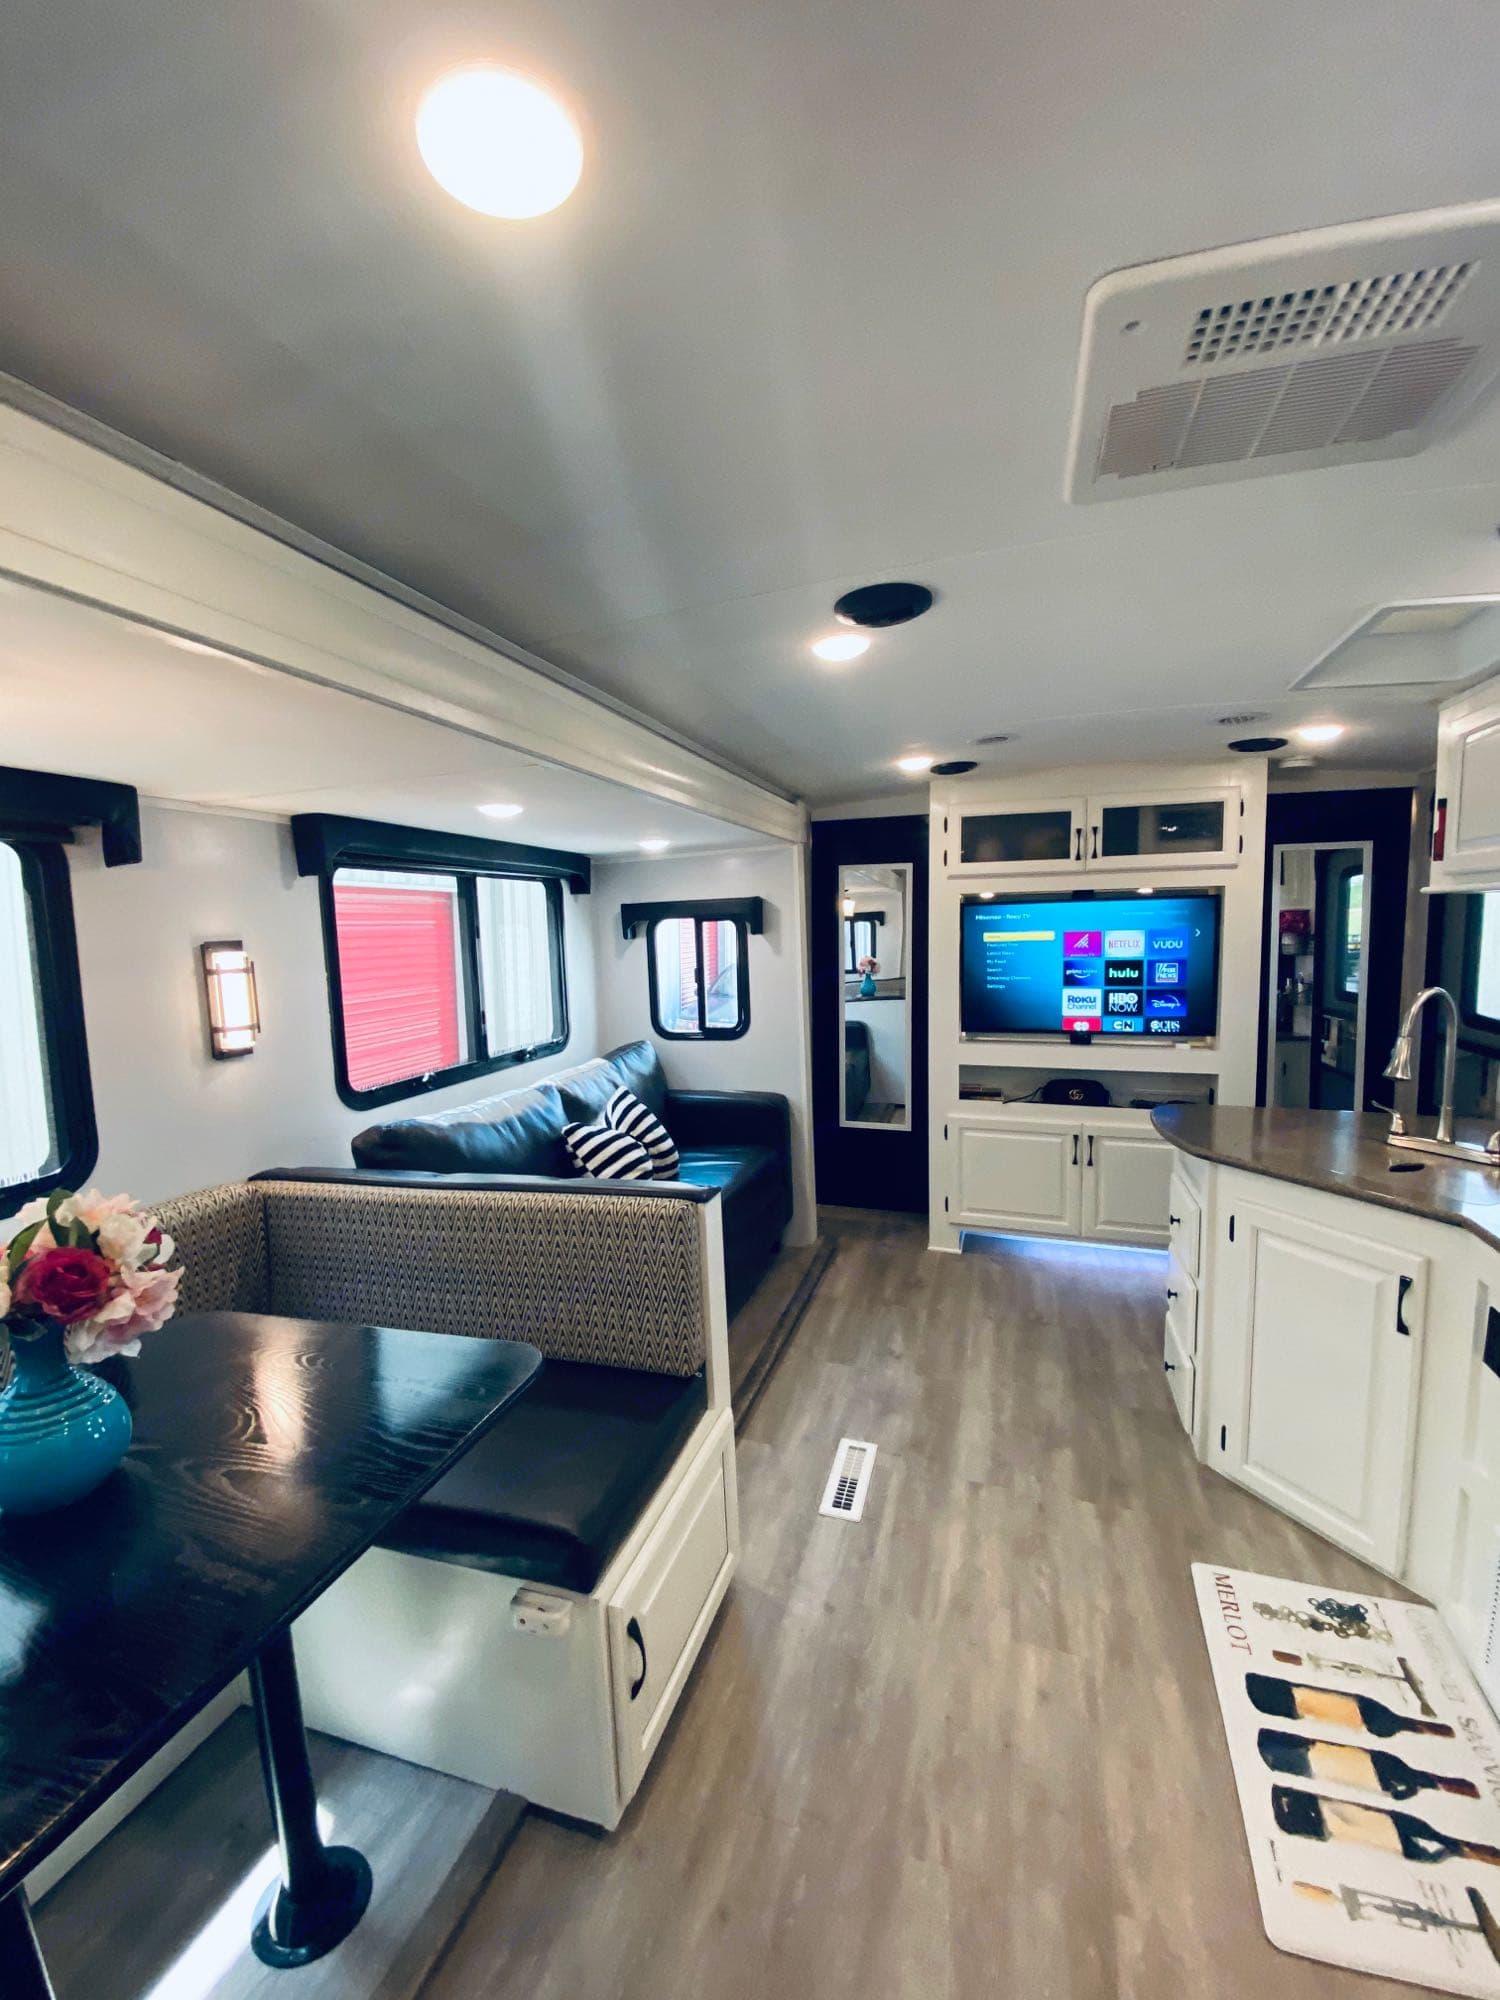 Living Room. Forest River Palomino Soloair 317 BHSK 2018